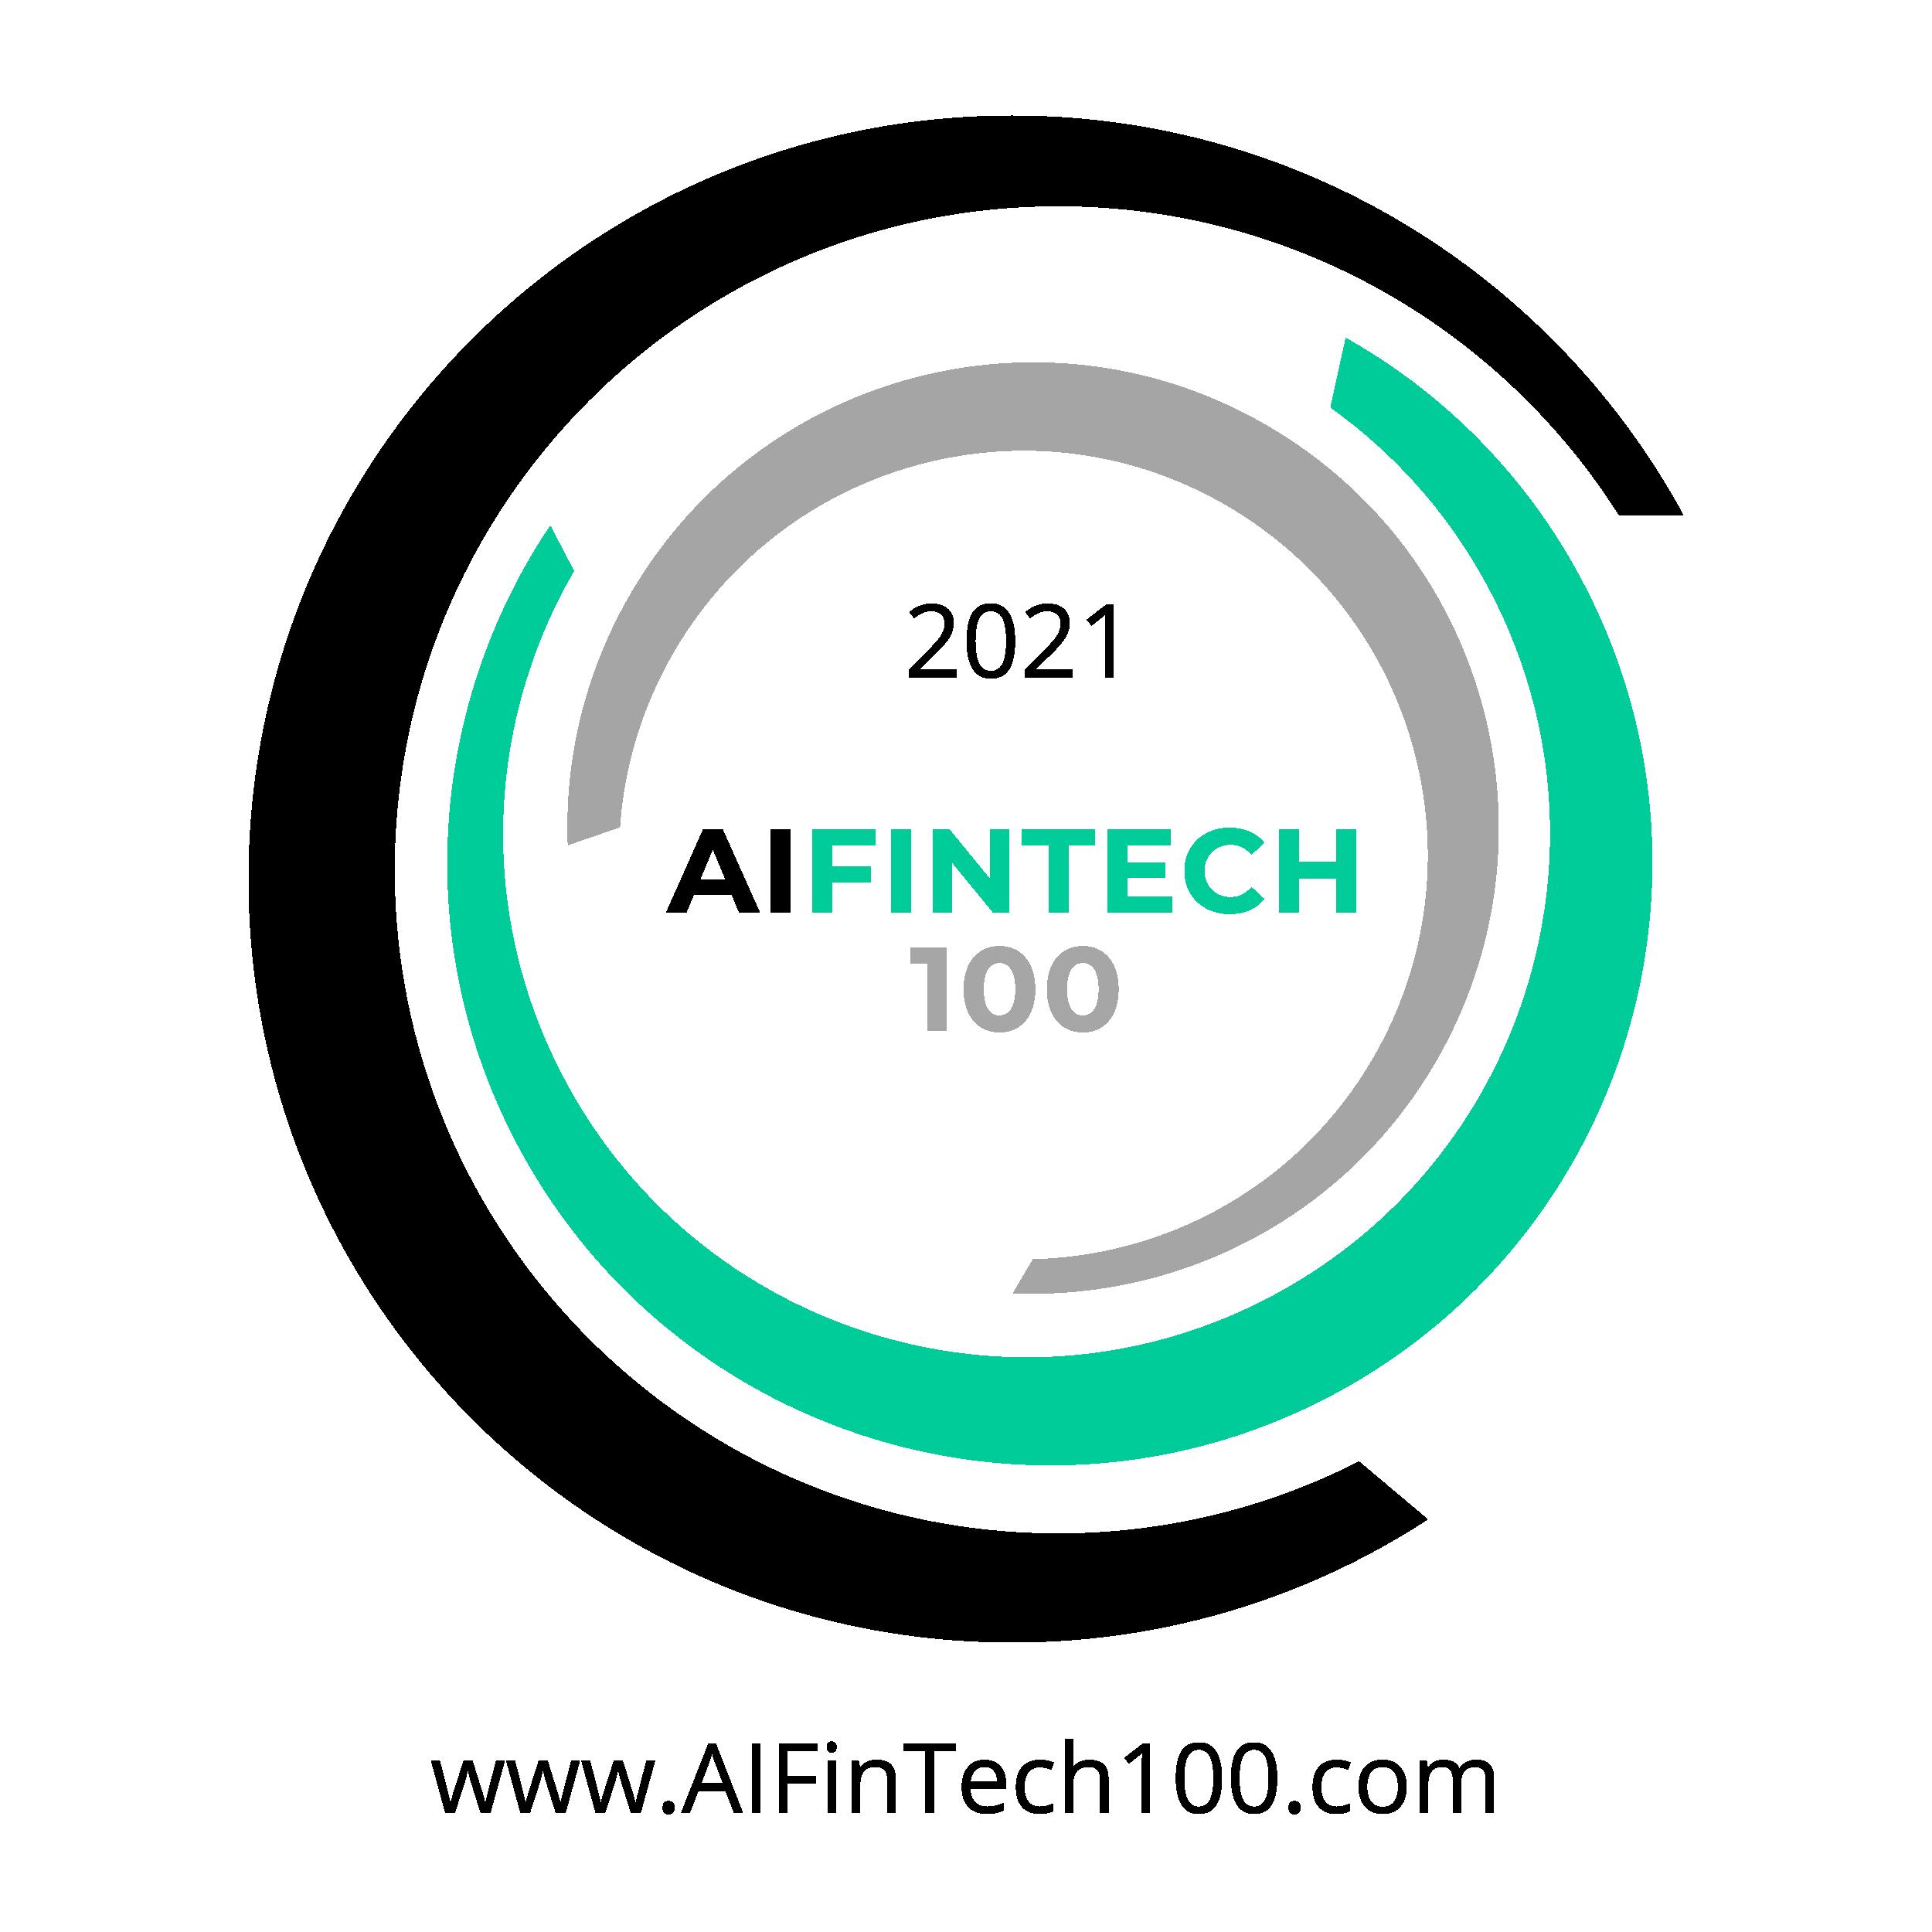 Logo AIFintech 2021